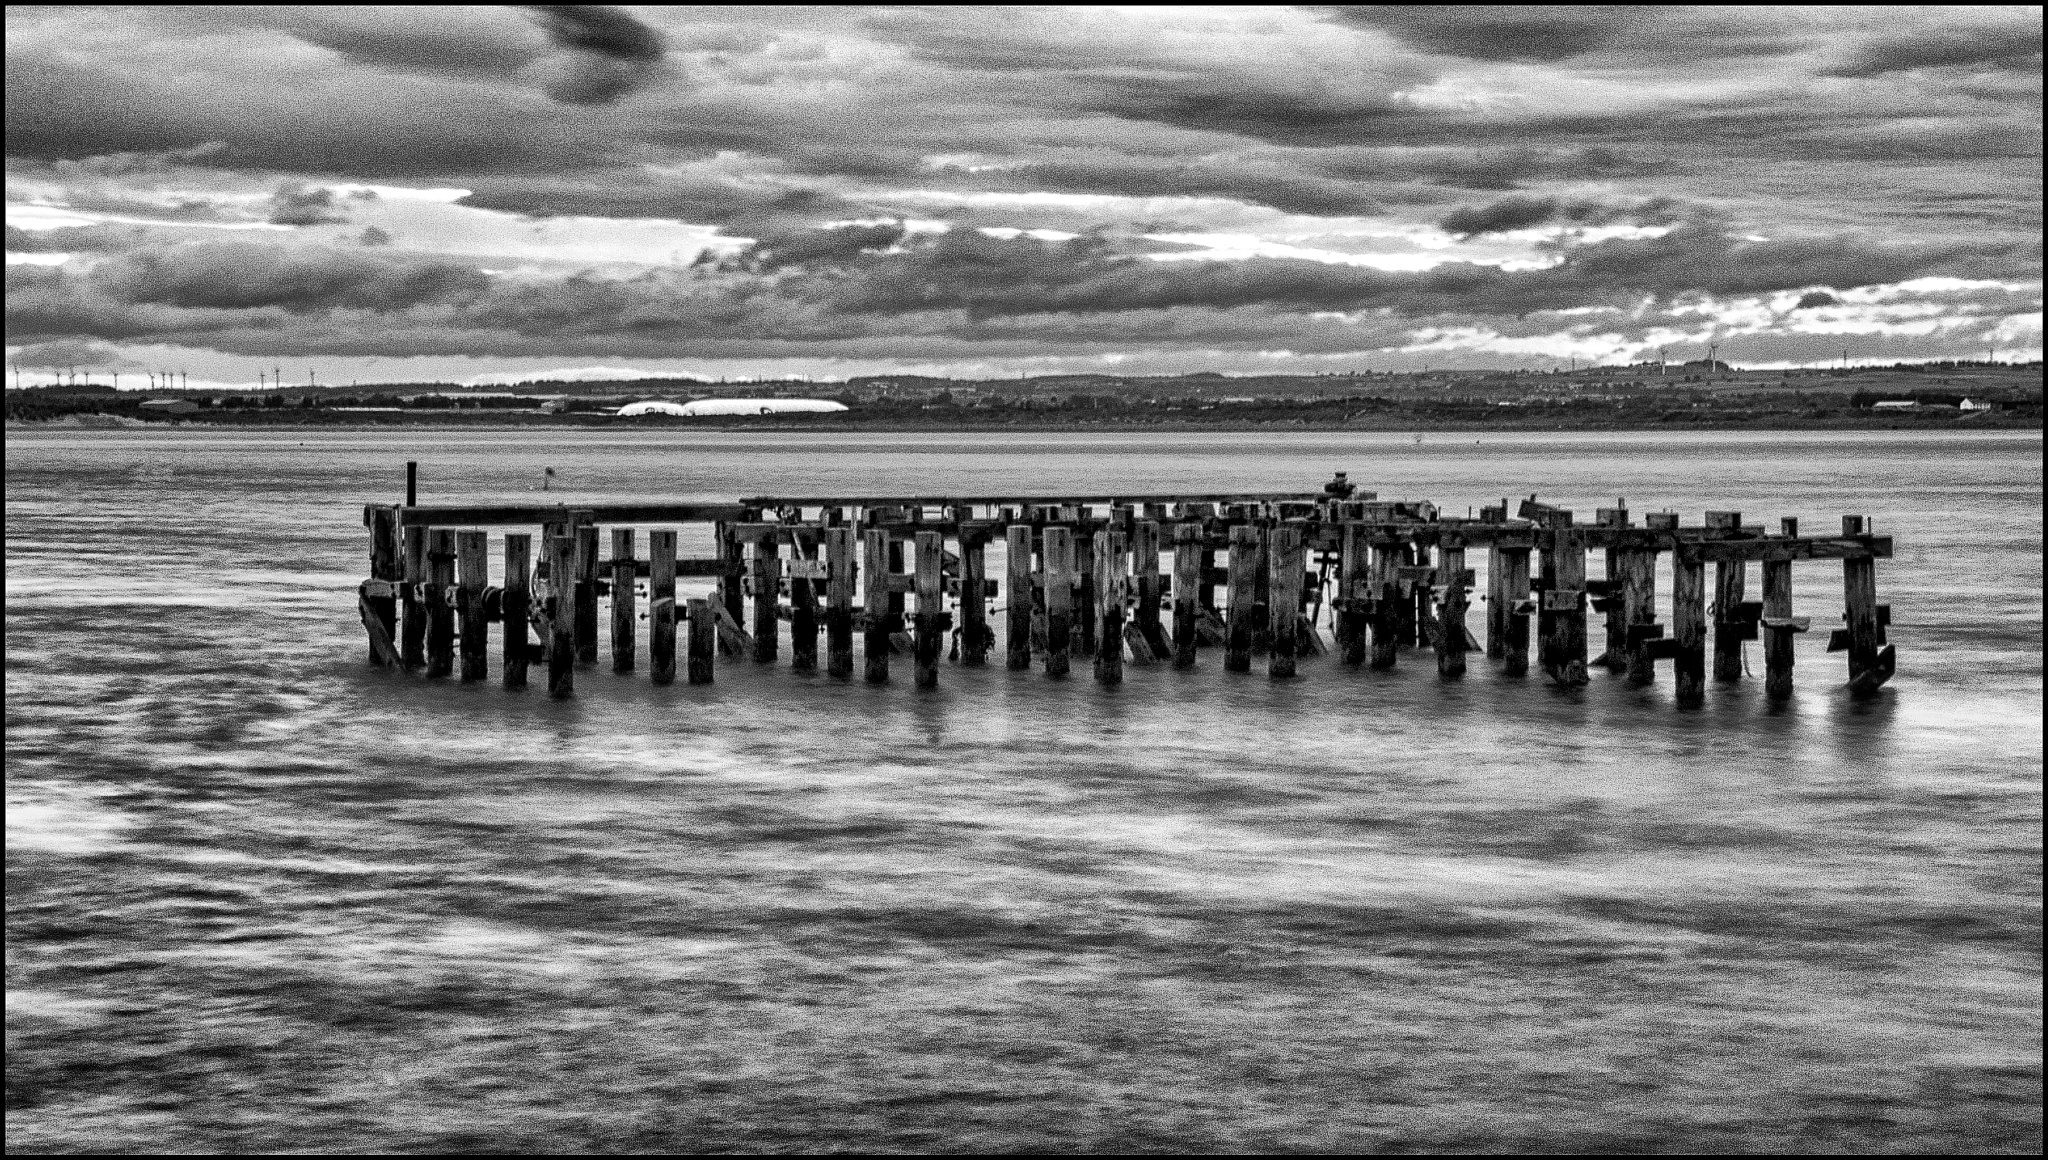 Dilapidated Wharf by martin.davis.5243817